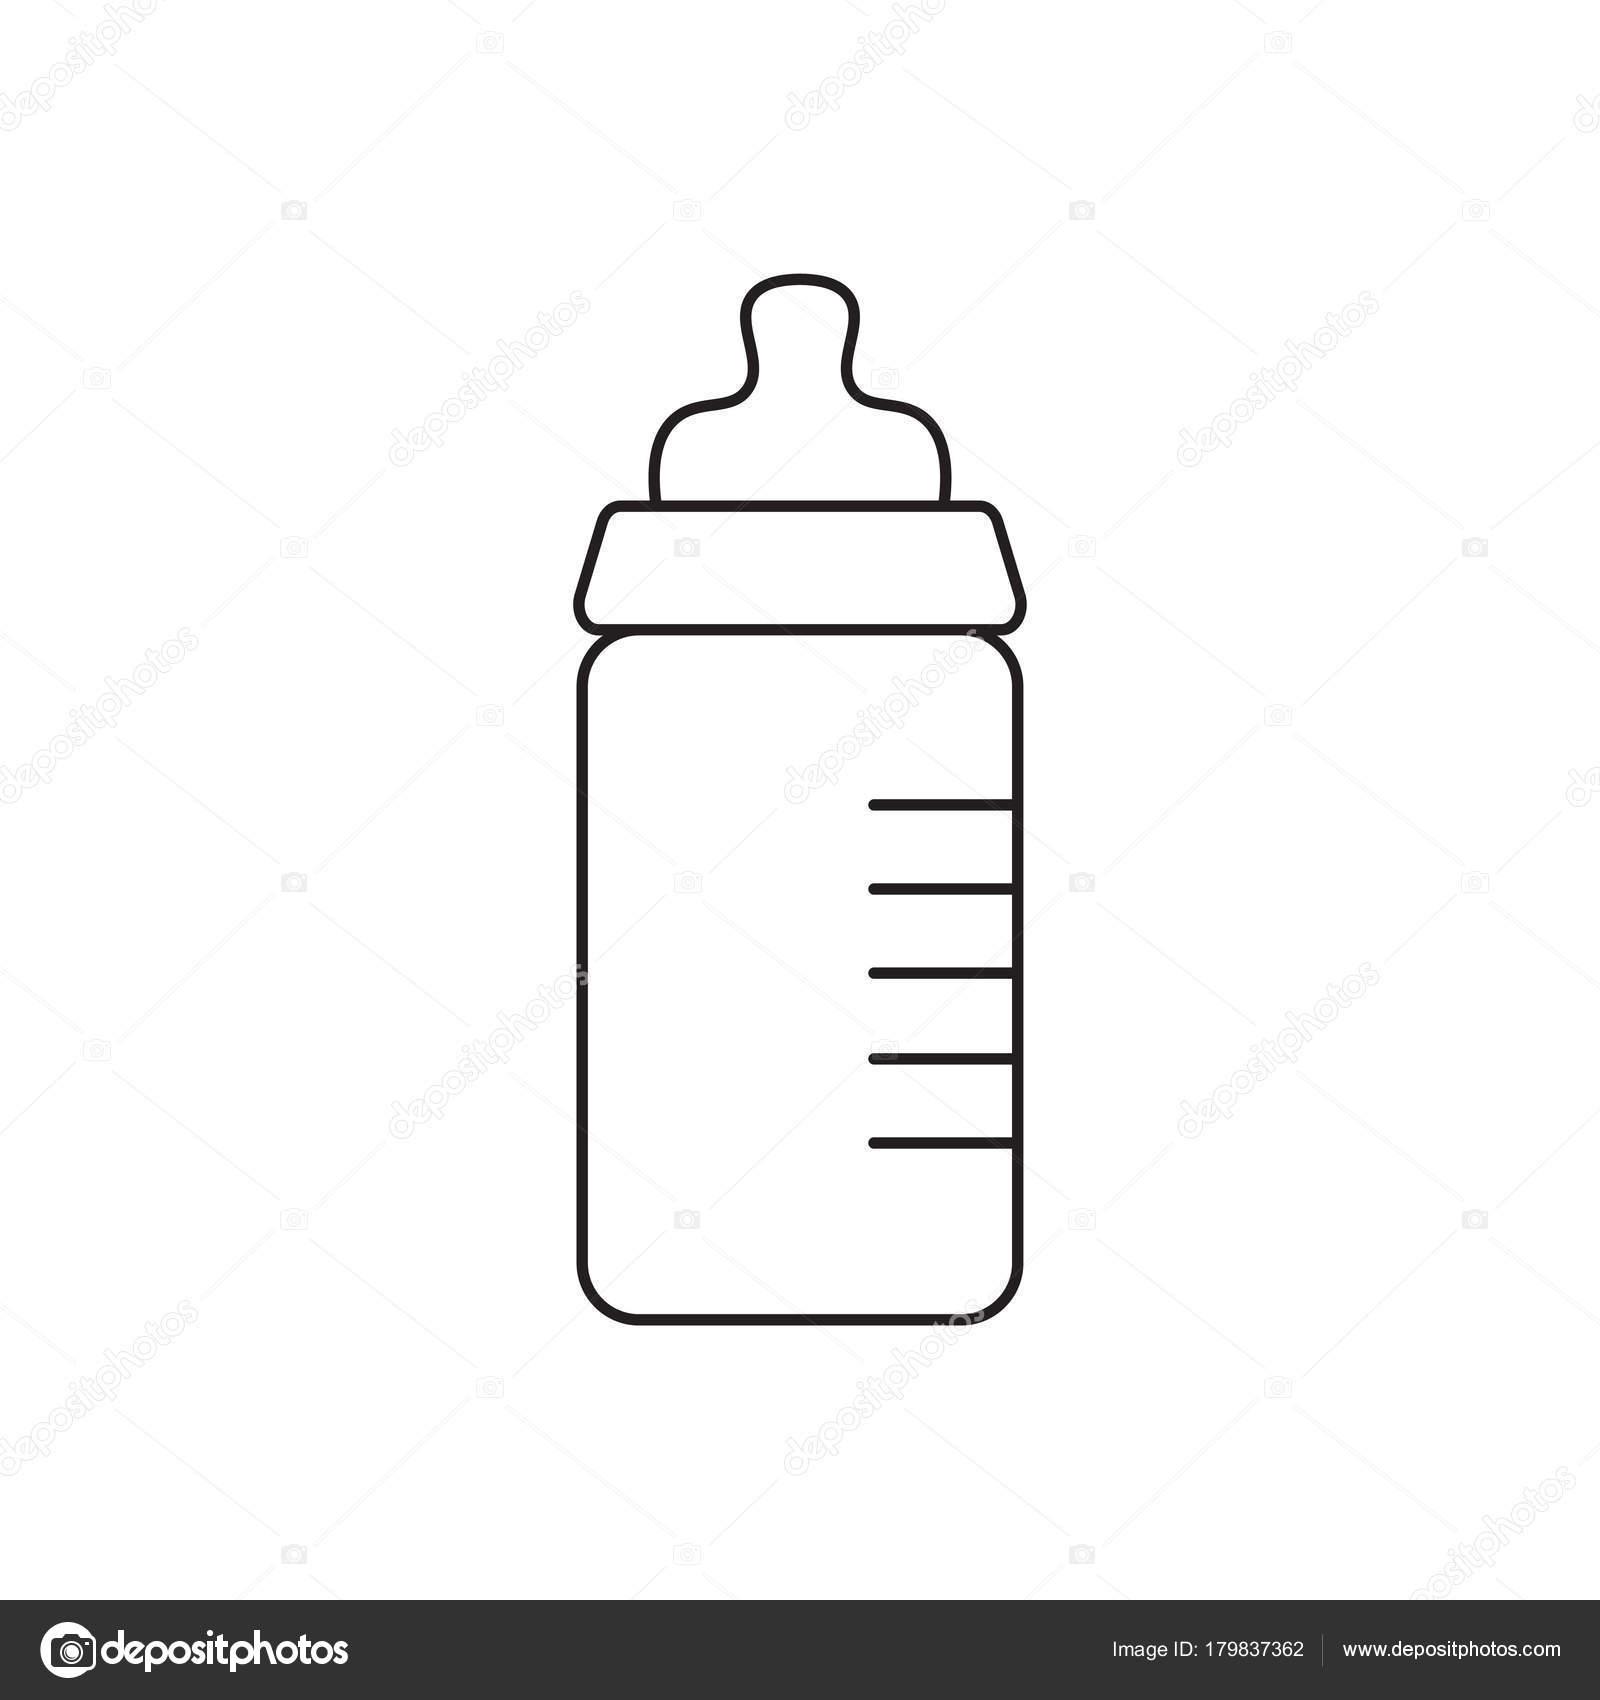 Biber n con ilustraci n de chupete icono vector vector - Dessin de biberon ...